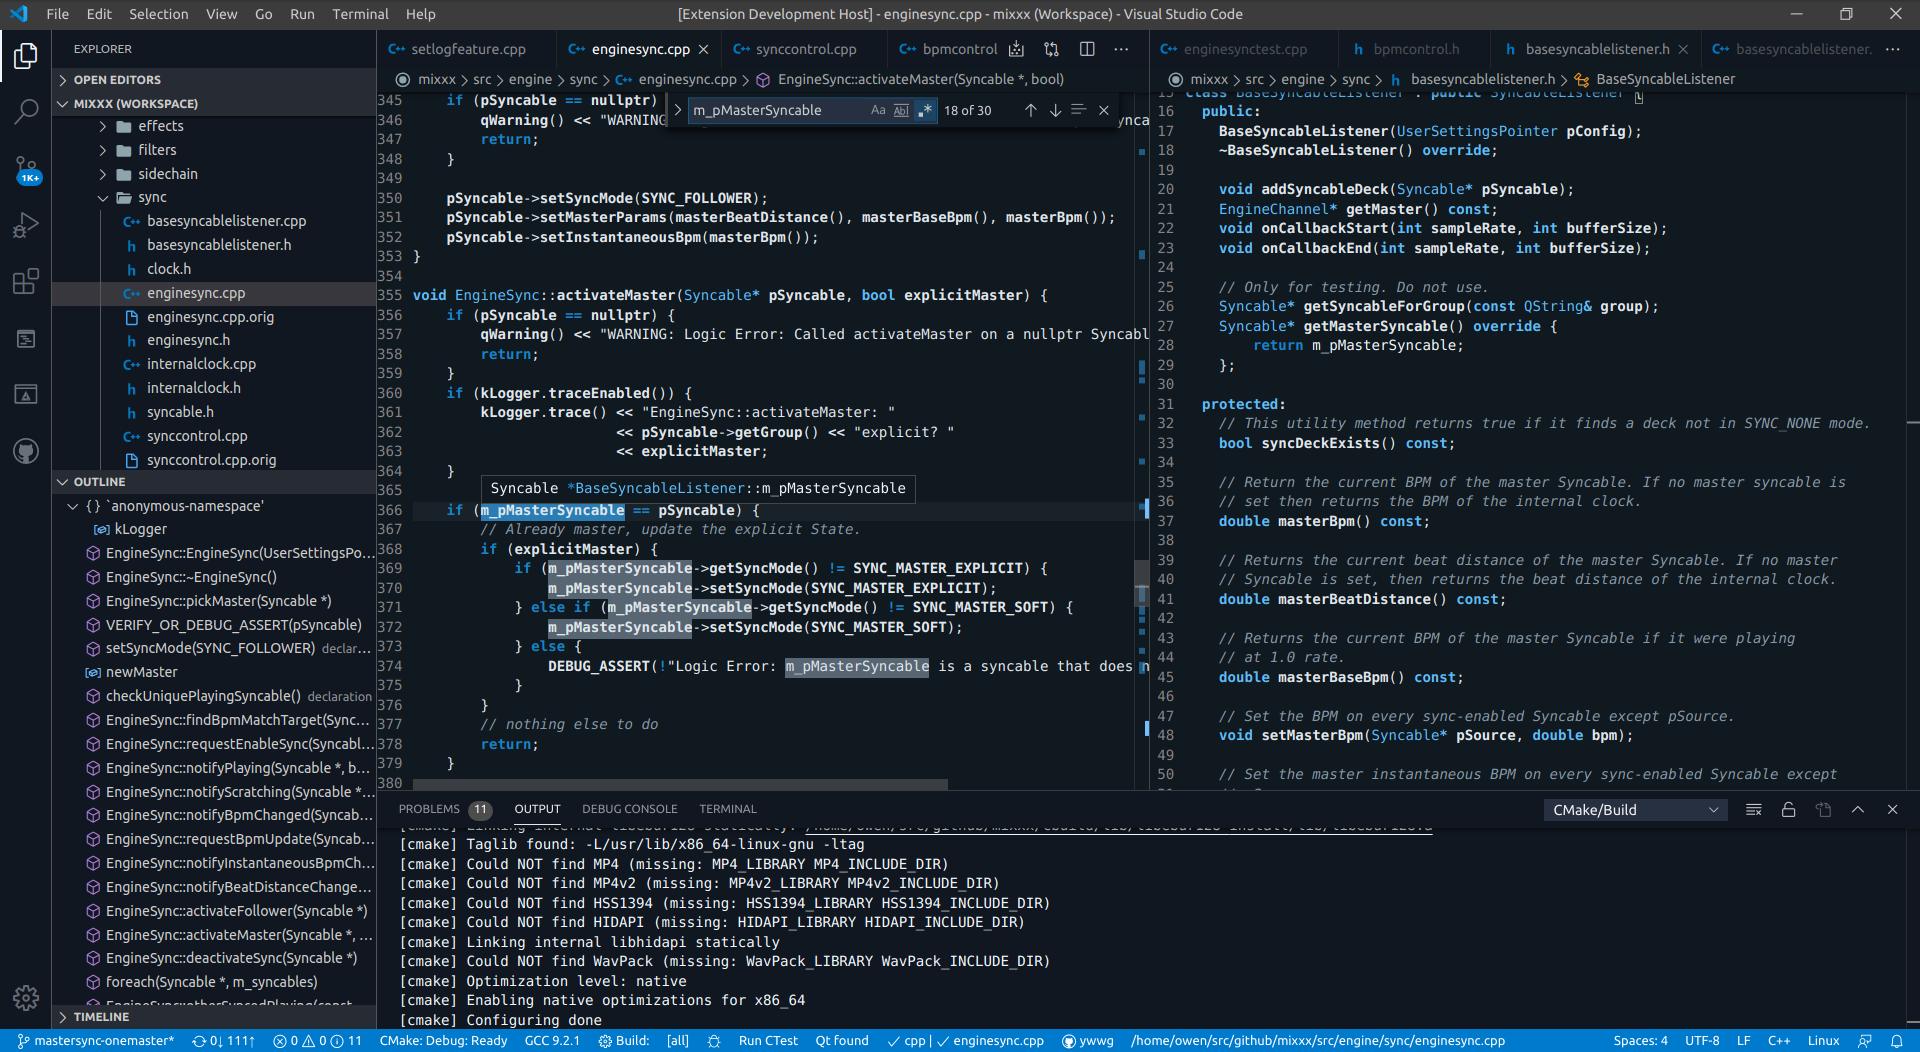 Visual Studio Code Cerulean dark theme preview